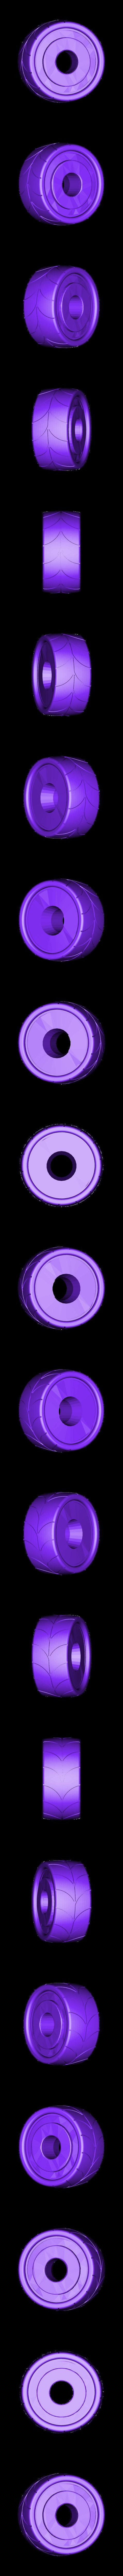 roue 3 avant Dr.stl Download free STL file Concept car EVO II M • 3D printer template, psl